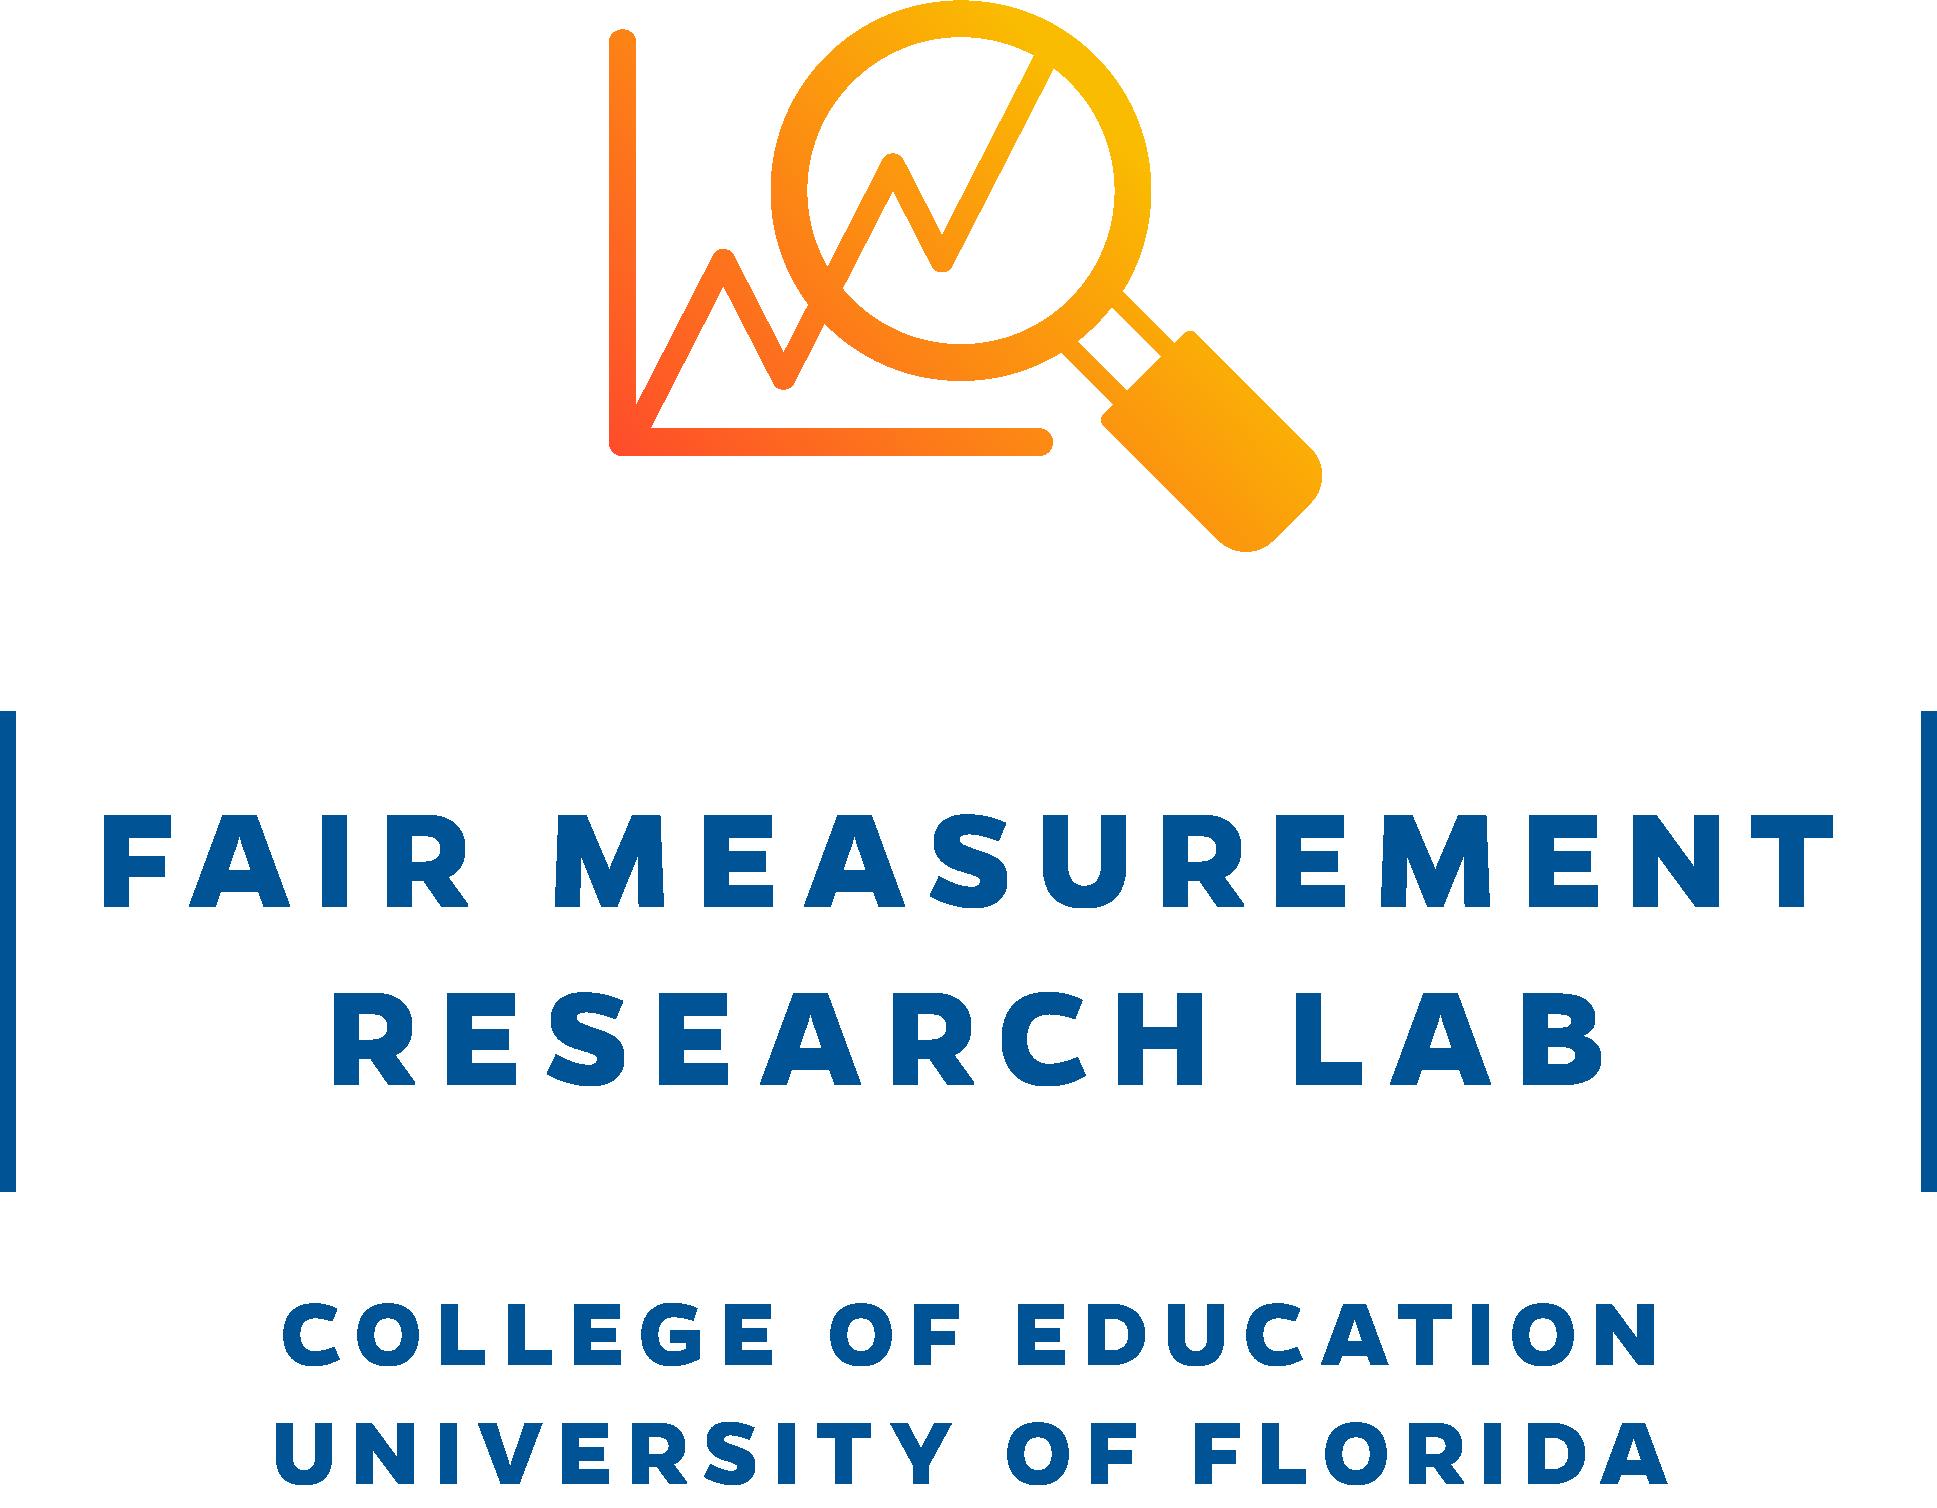 Fair Measurement Research Lab - College of Education - University of Florida